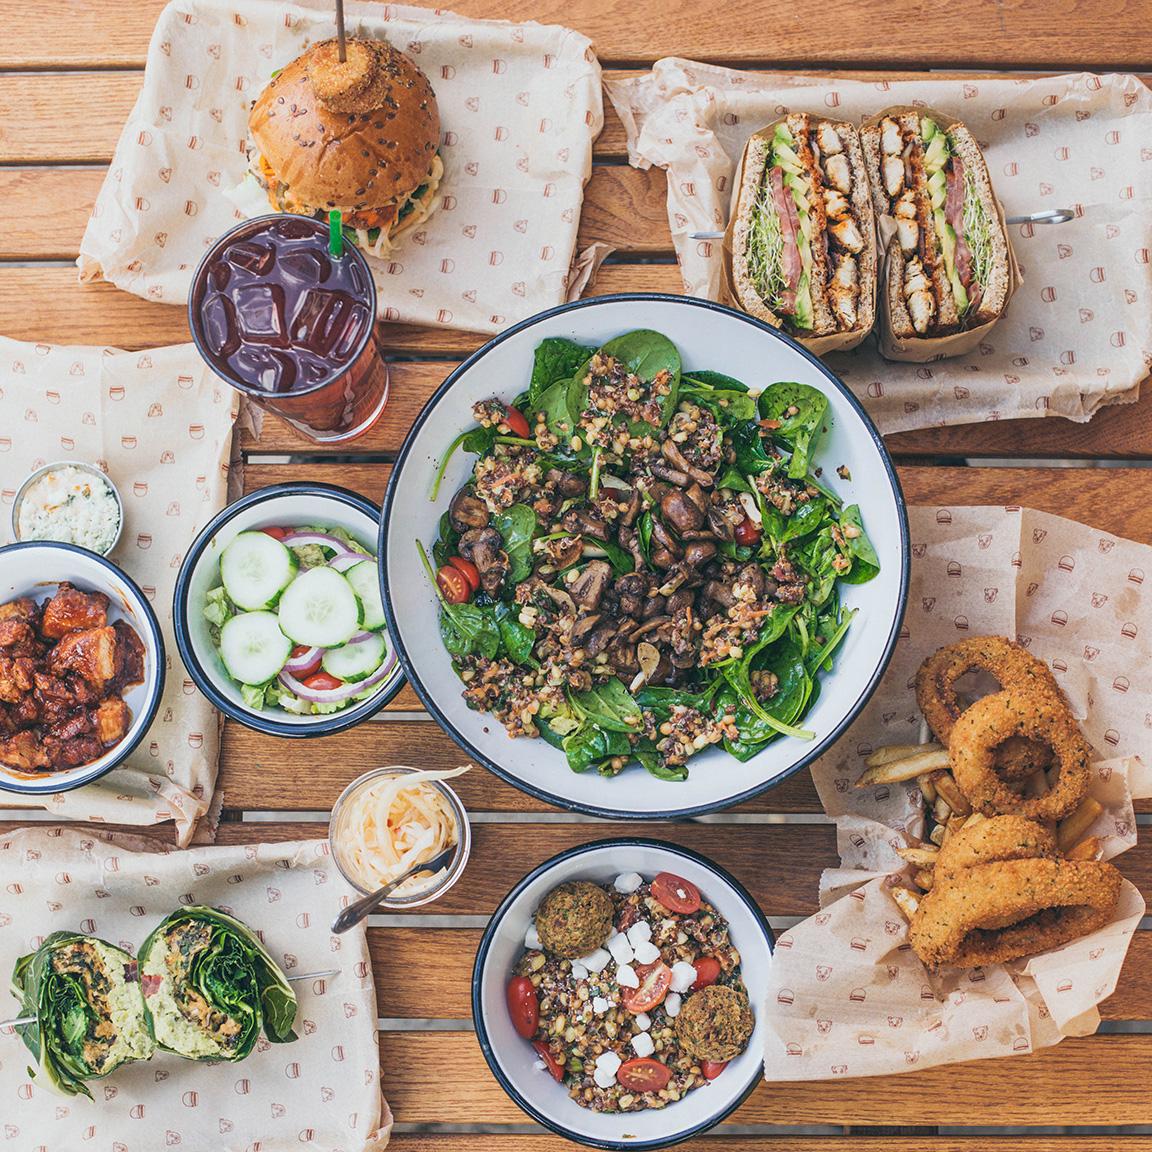 bareburger - menu design, promo design & illustration